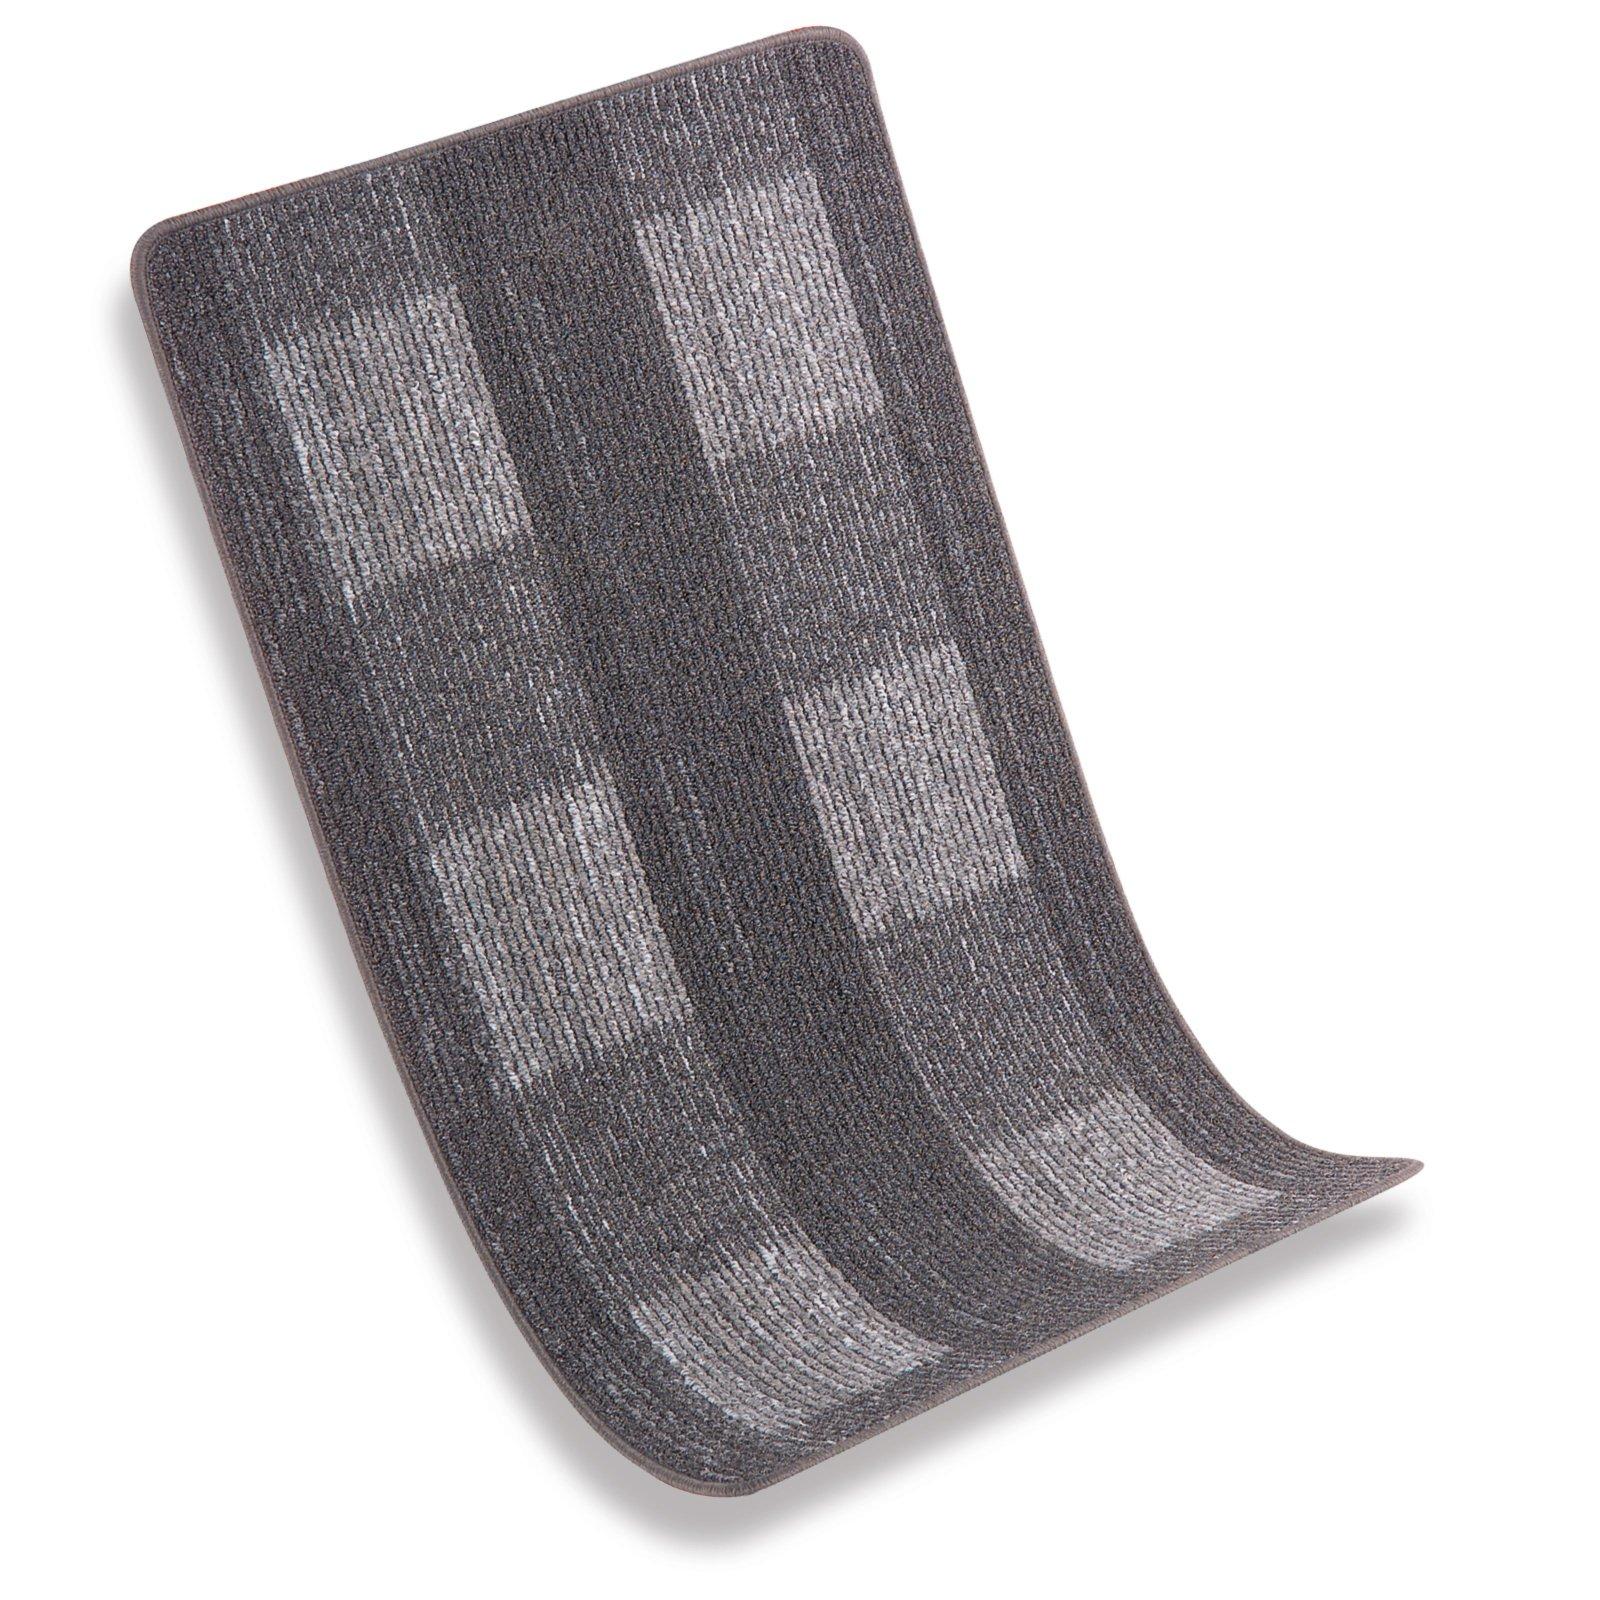 Kettelteppich KARREE - grau - 67x120 cm